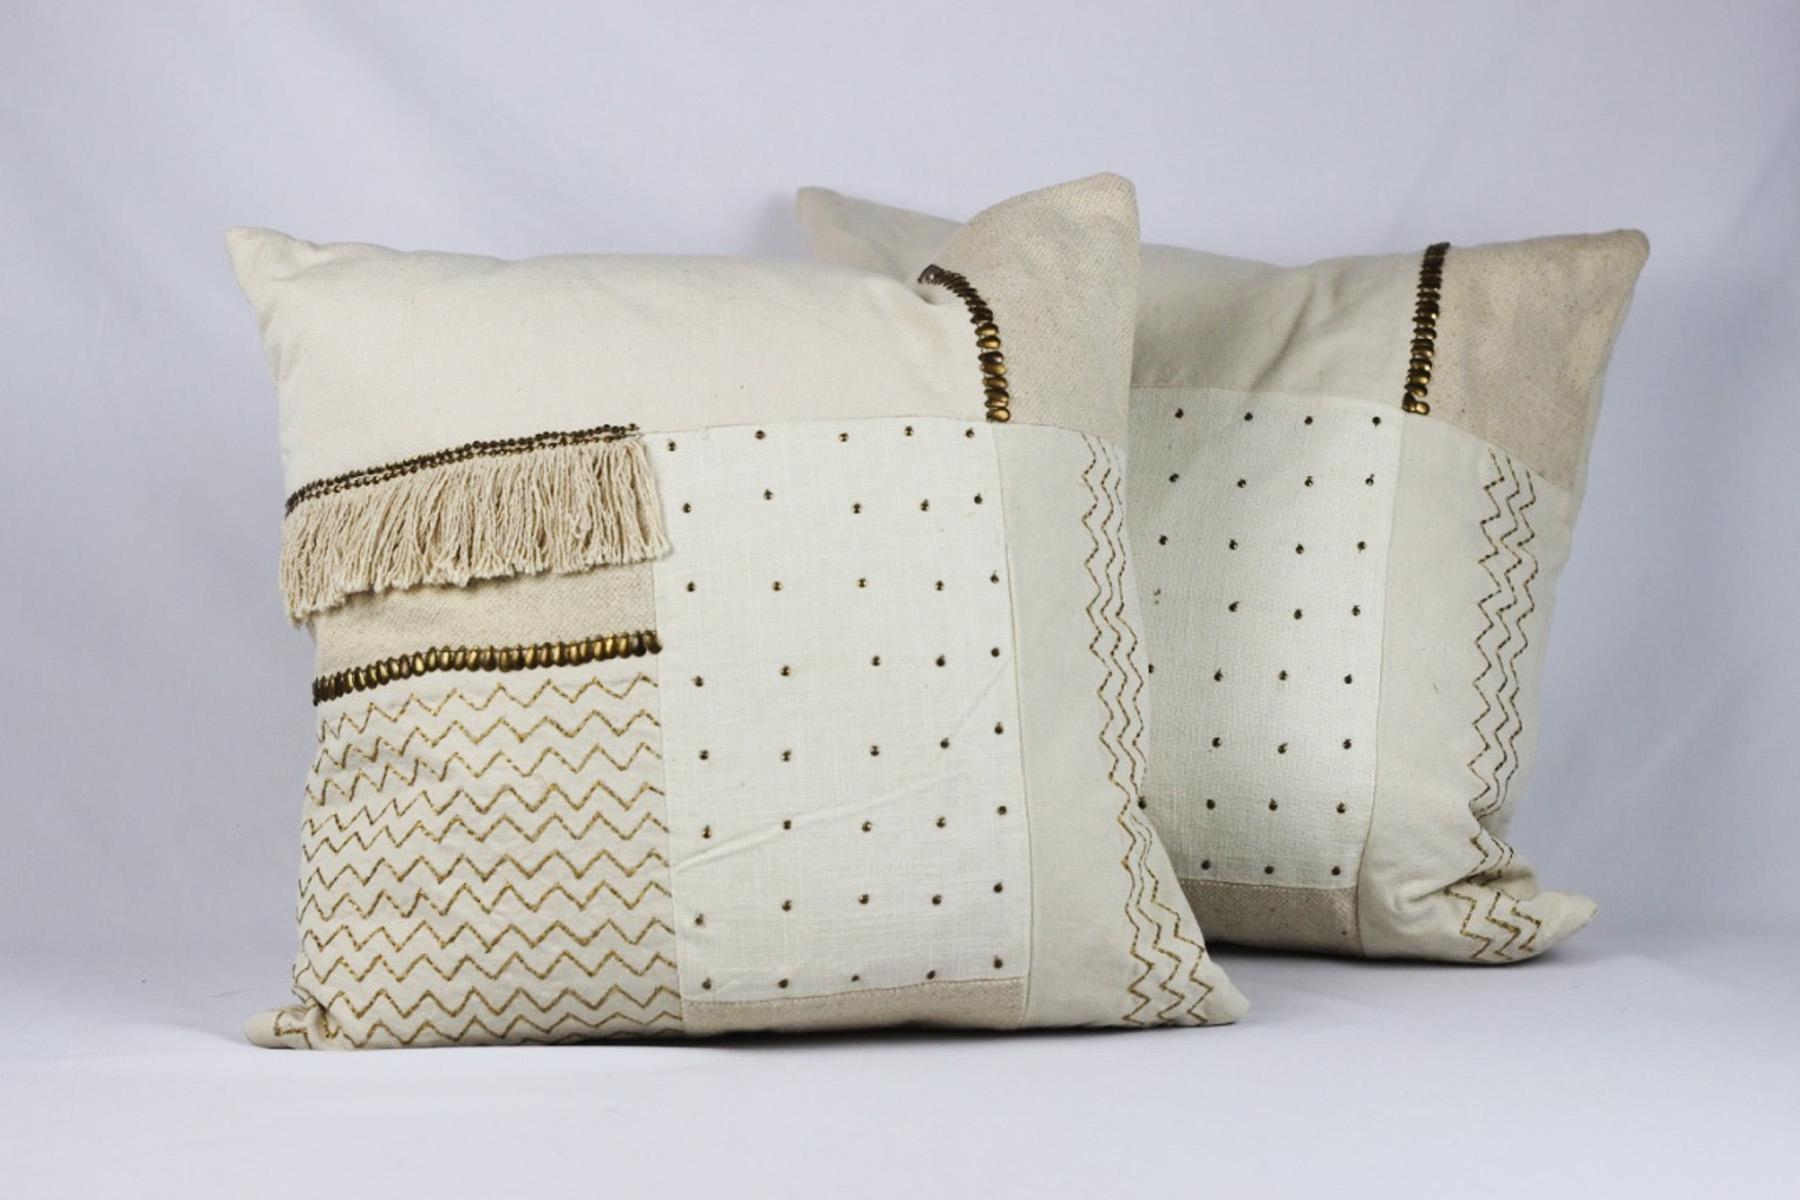 Marlowe Pillows - Scavenged Vintage Rentals